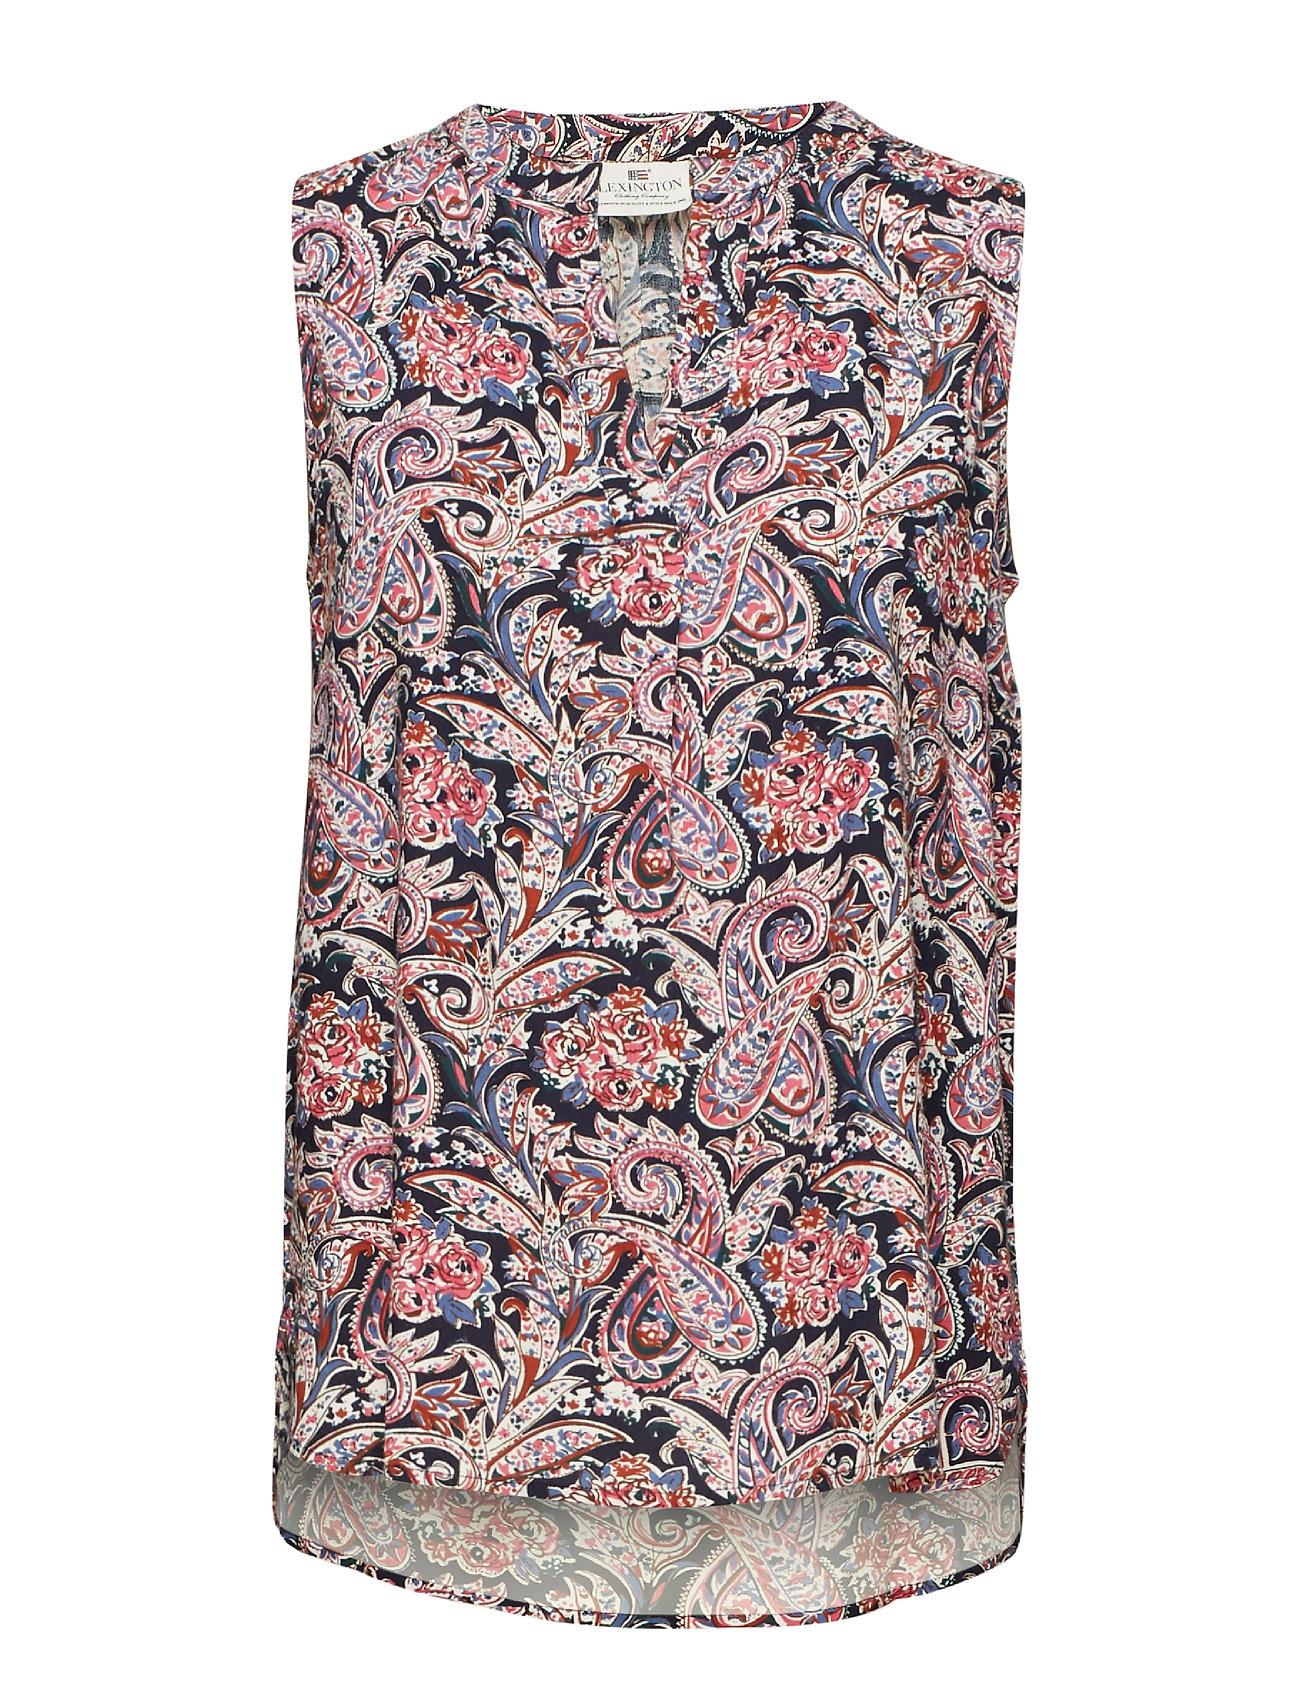 Lexington Clothing Nadeen Paisley Top - PAISLEY PRINT